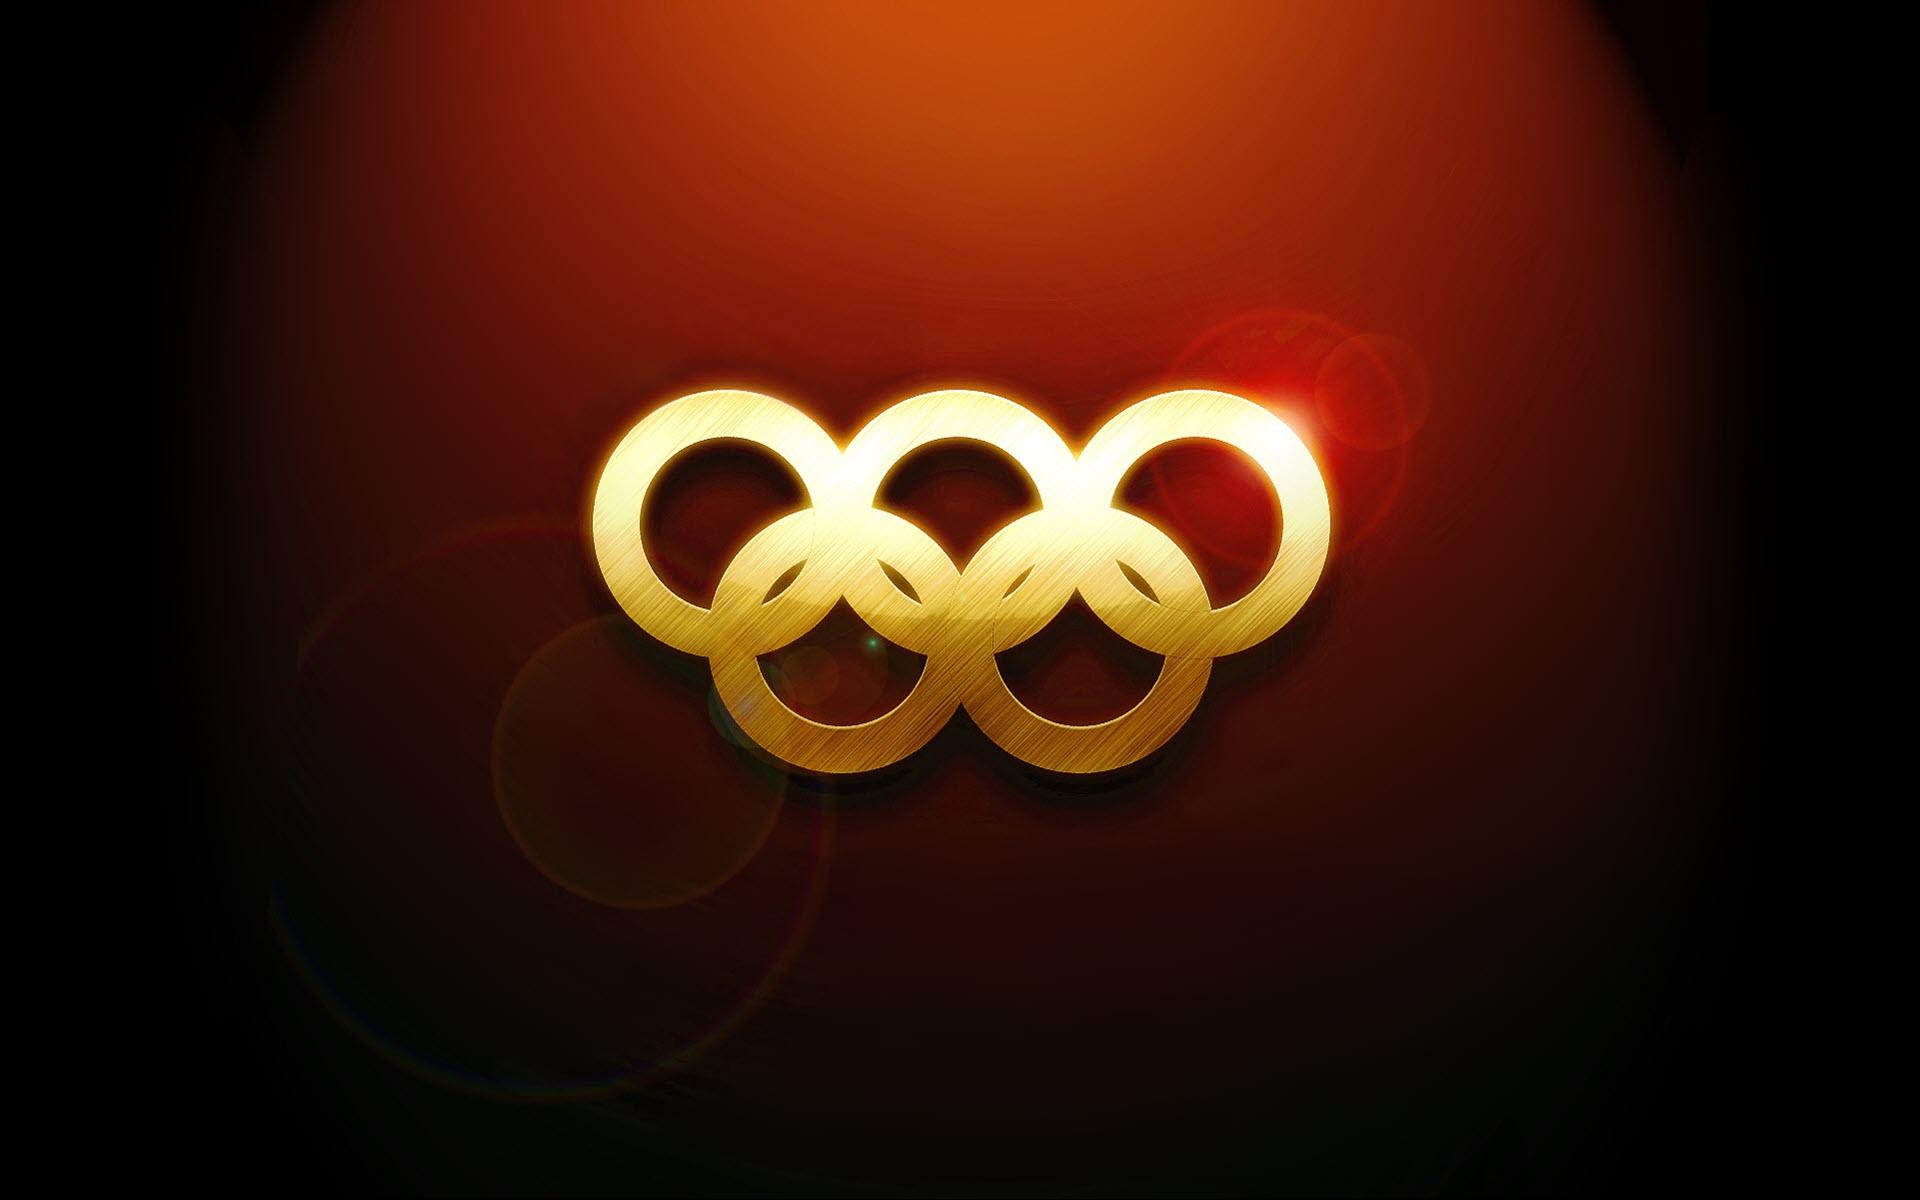 Beijing olympics weightlifting wallpaper 5 1024x768 wallpaper - Beijing Olympics Weightlifting Wallpaper 5 1024x768 Wallpaper 25